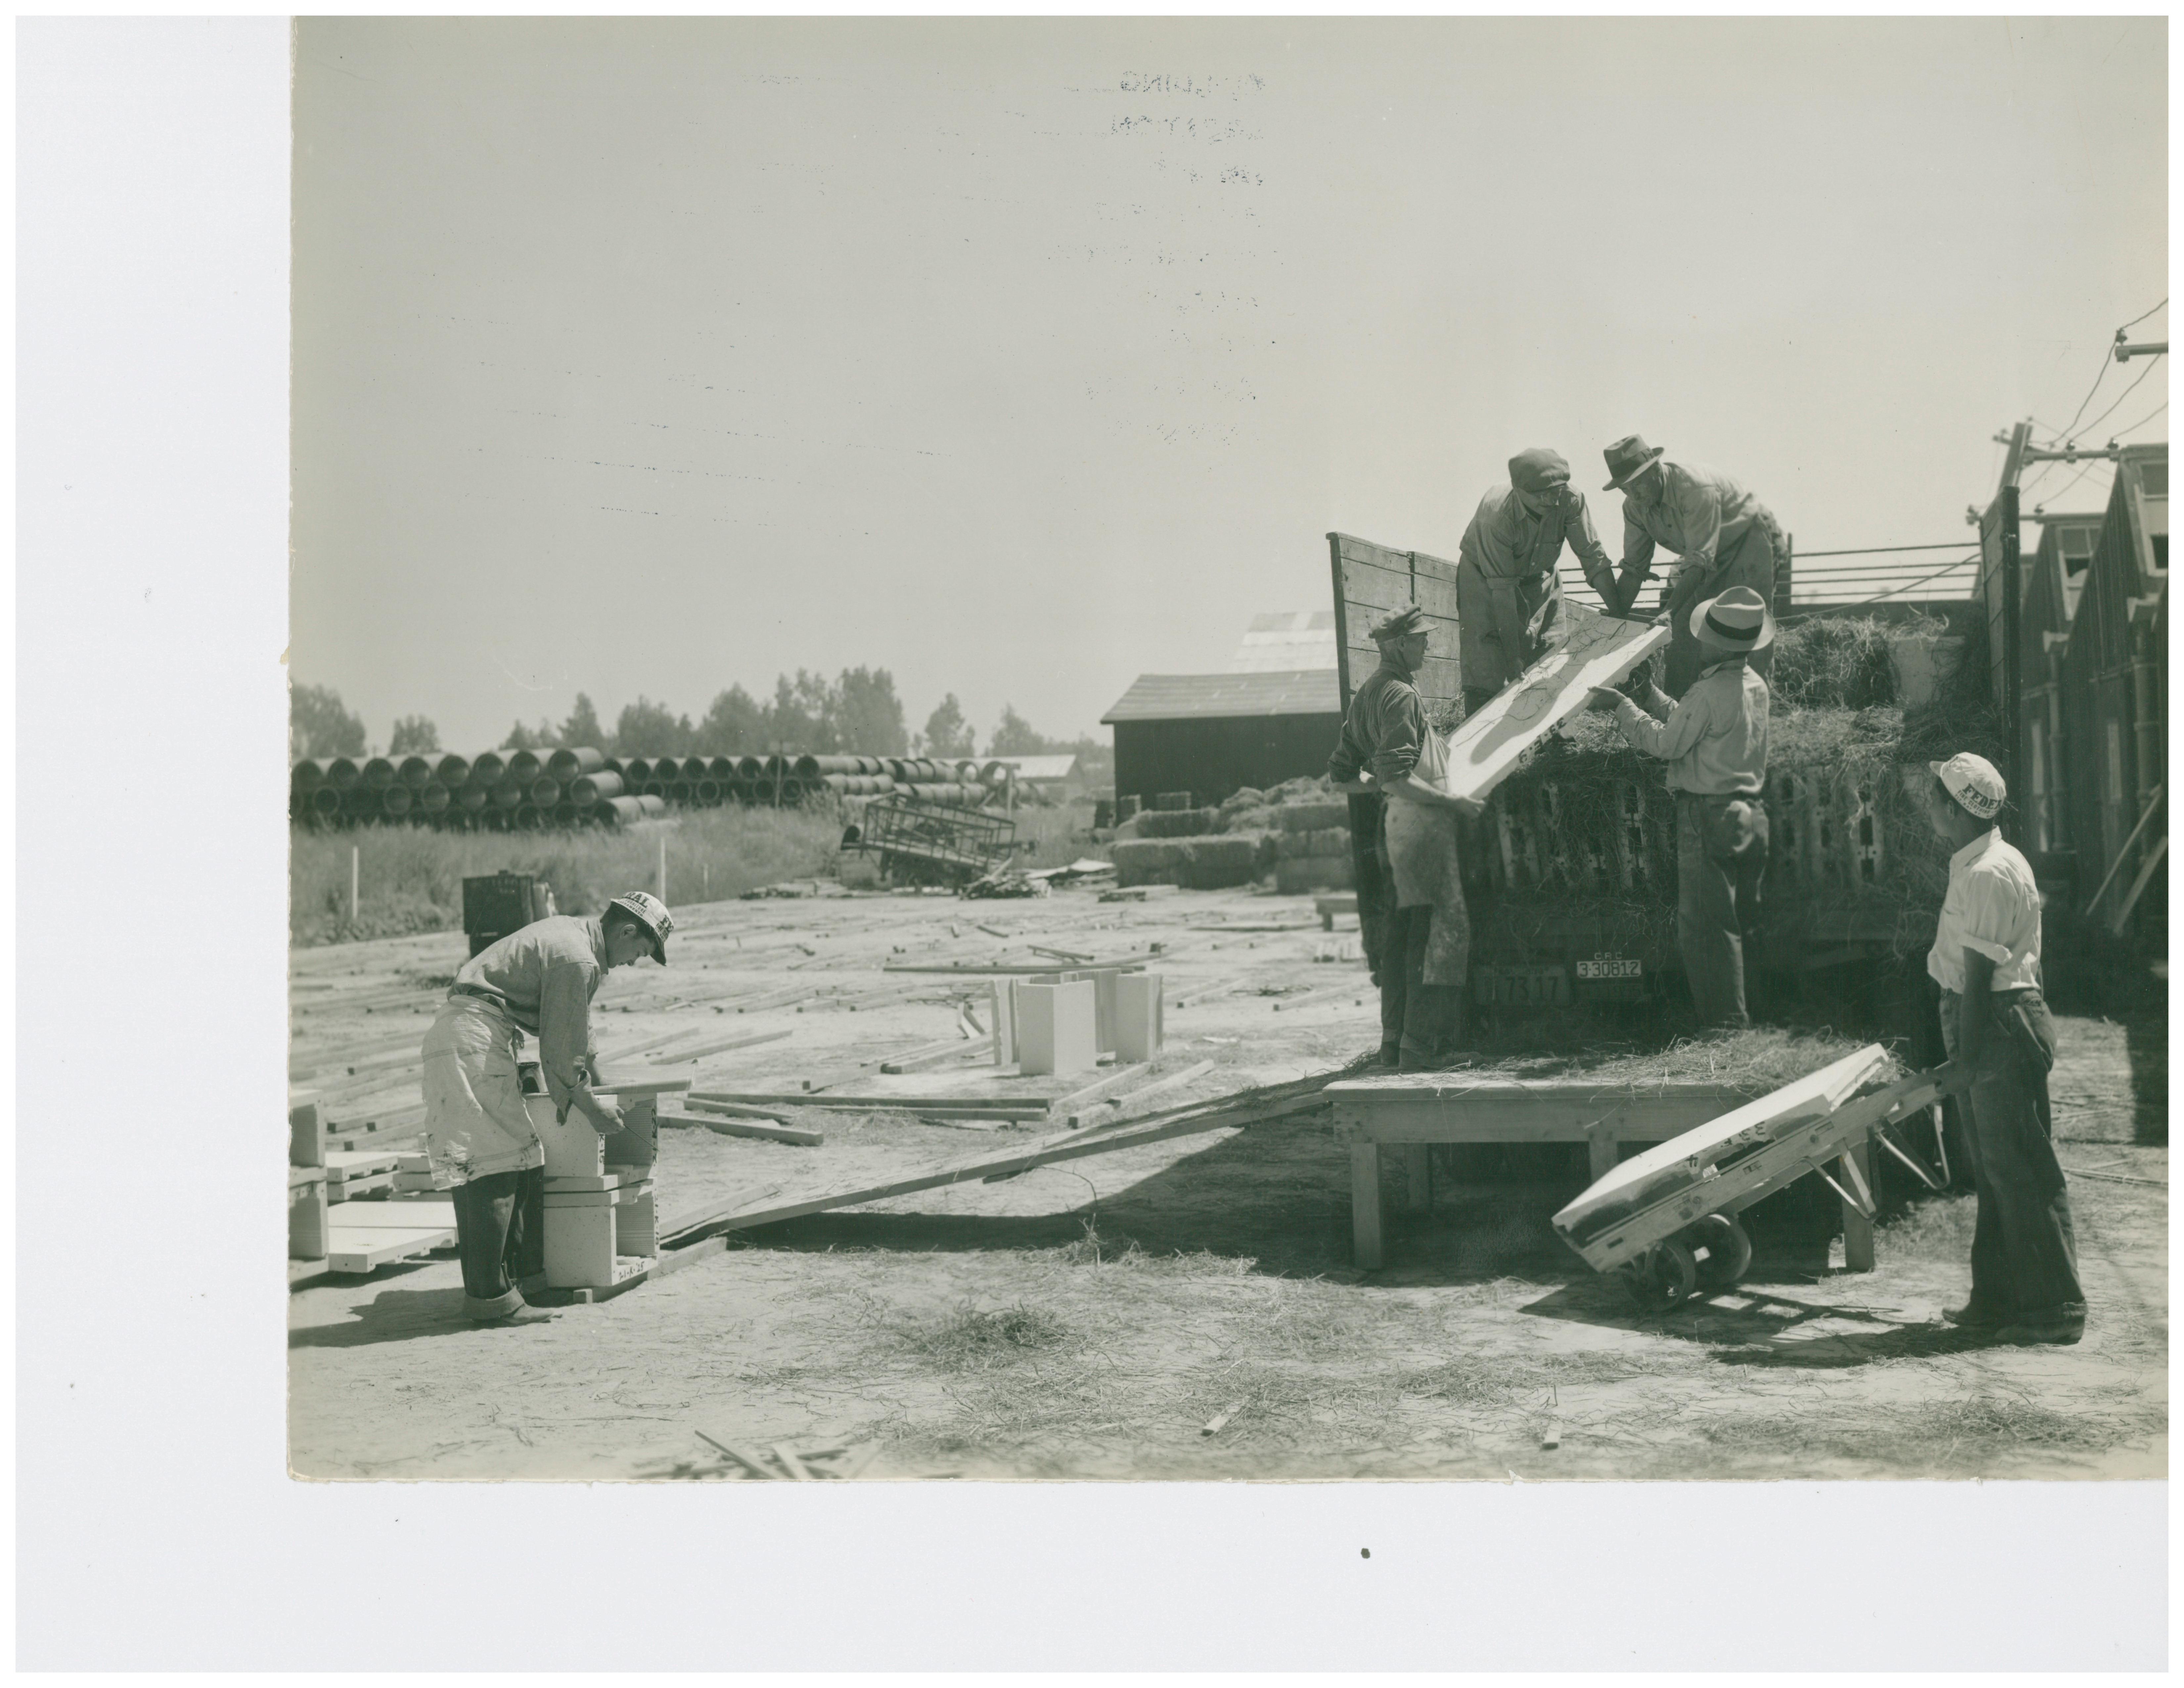 1946 Loading